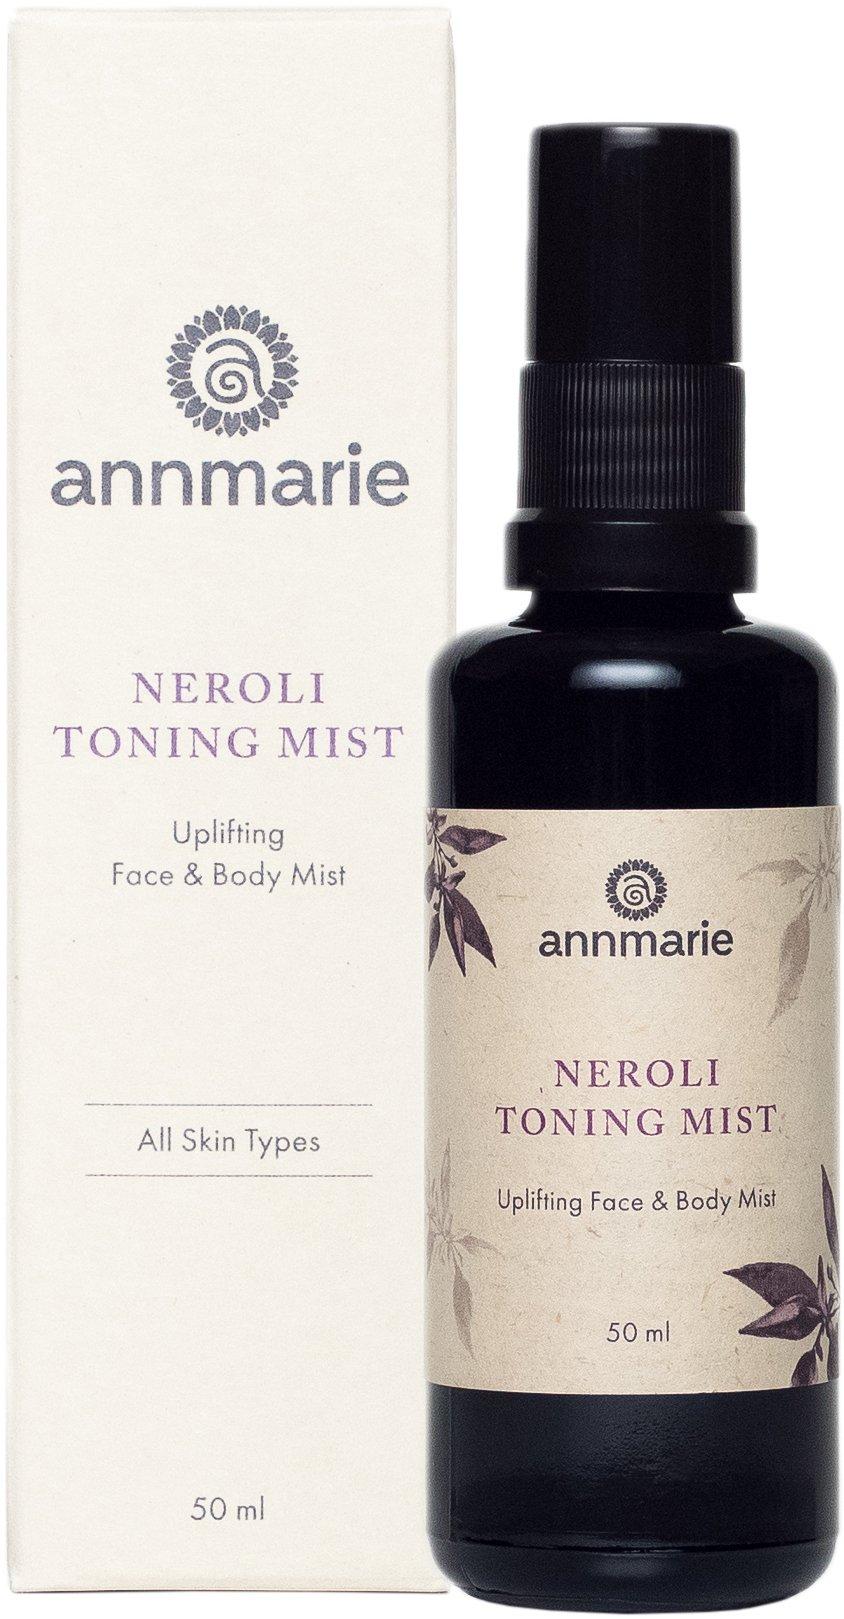 Annmarie Skin Care Neroli Toning Mist - Face and Body Mist with Neroli Essential Oil, Aloe Vera + Aspen Bark Extract (50 Milliliters, 1.7 Fluid Ounces)